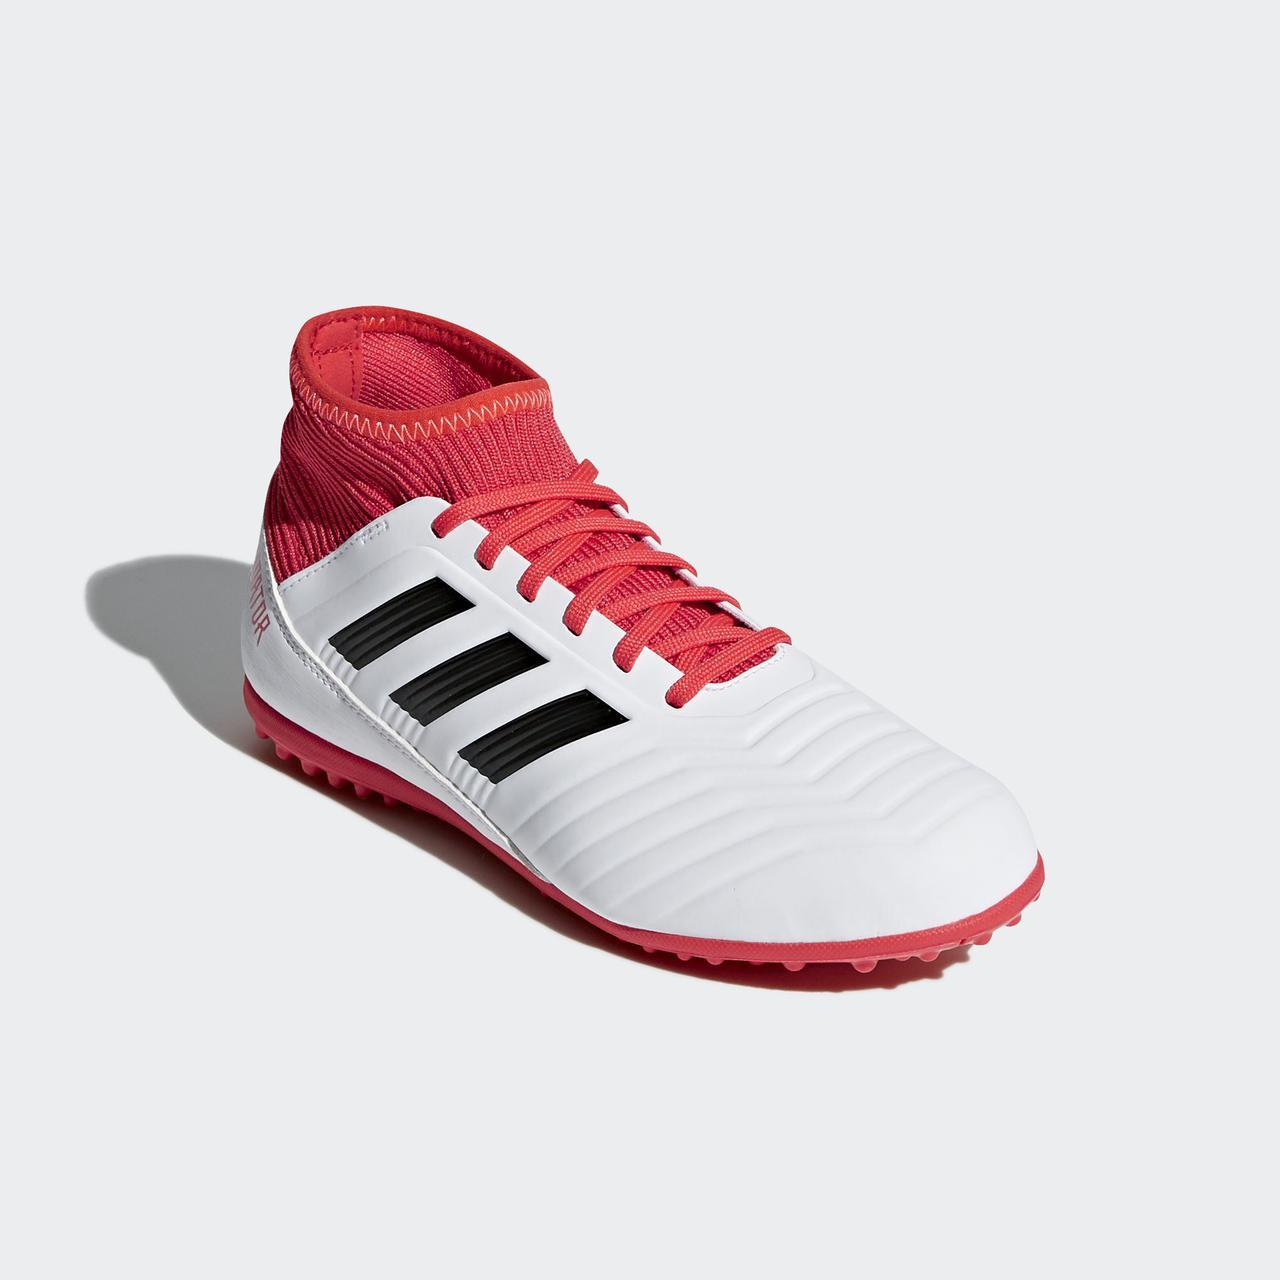 f468a40d0033 ... фото Детские футбольные бутсы Adidas Performance Predator Tango 18.3 TF  (Артикул  CP9040), ...